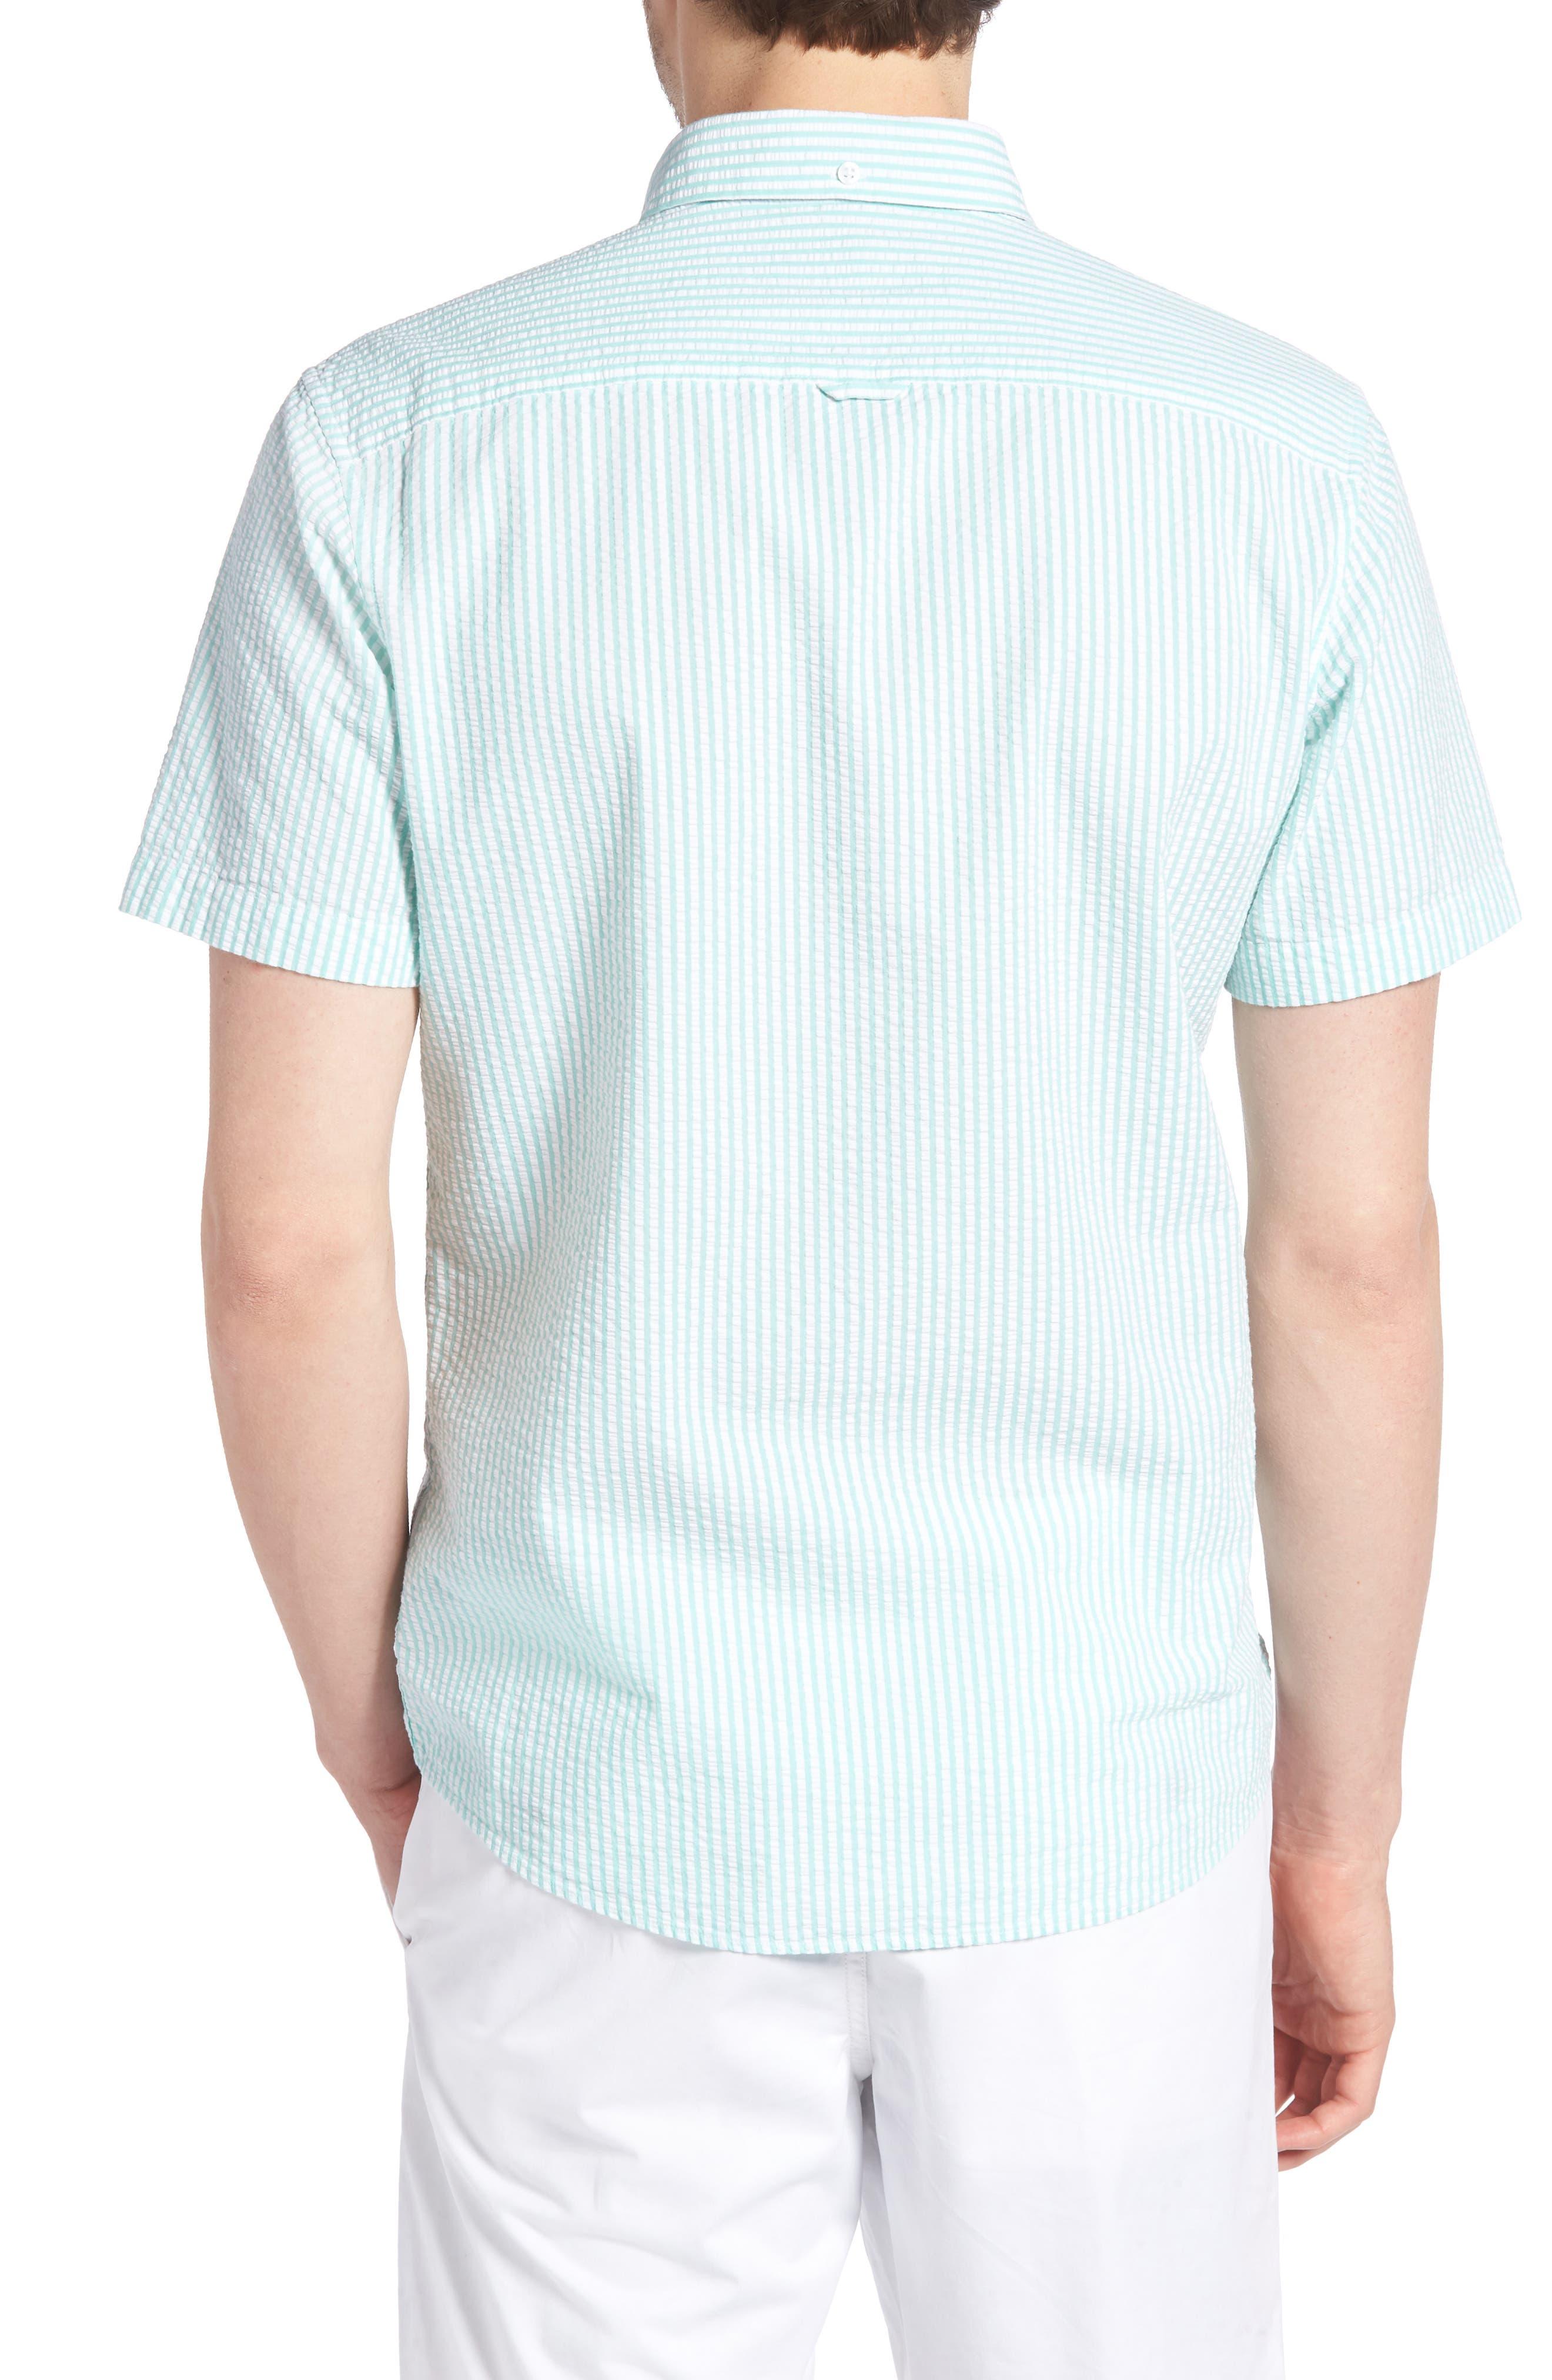 Trim Fit Seersucker Short Sleeve Sport Shirt,                             Alternate thumbnail 3, color,                             White Green Seersucker Stripe